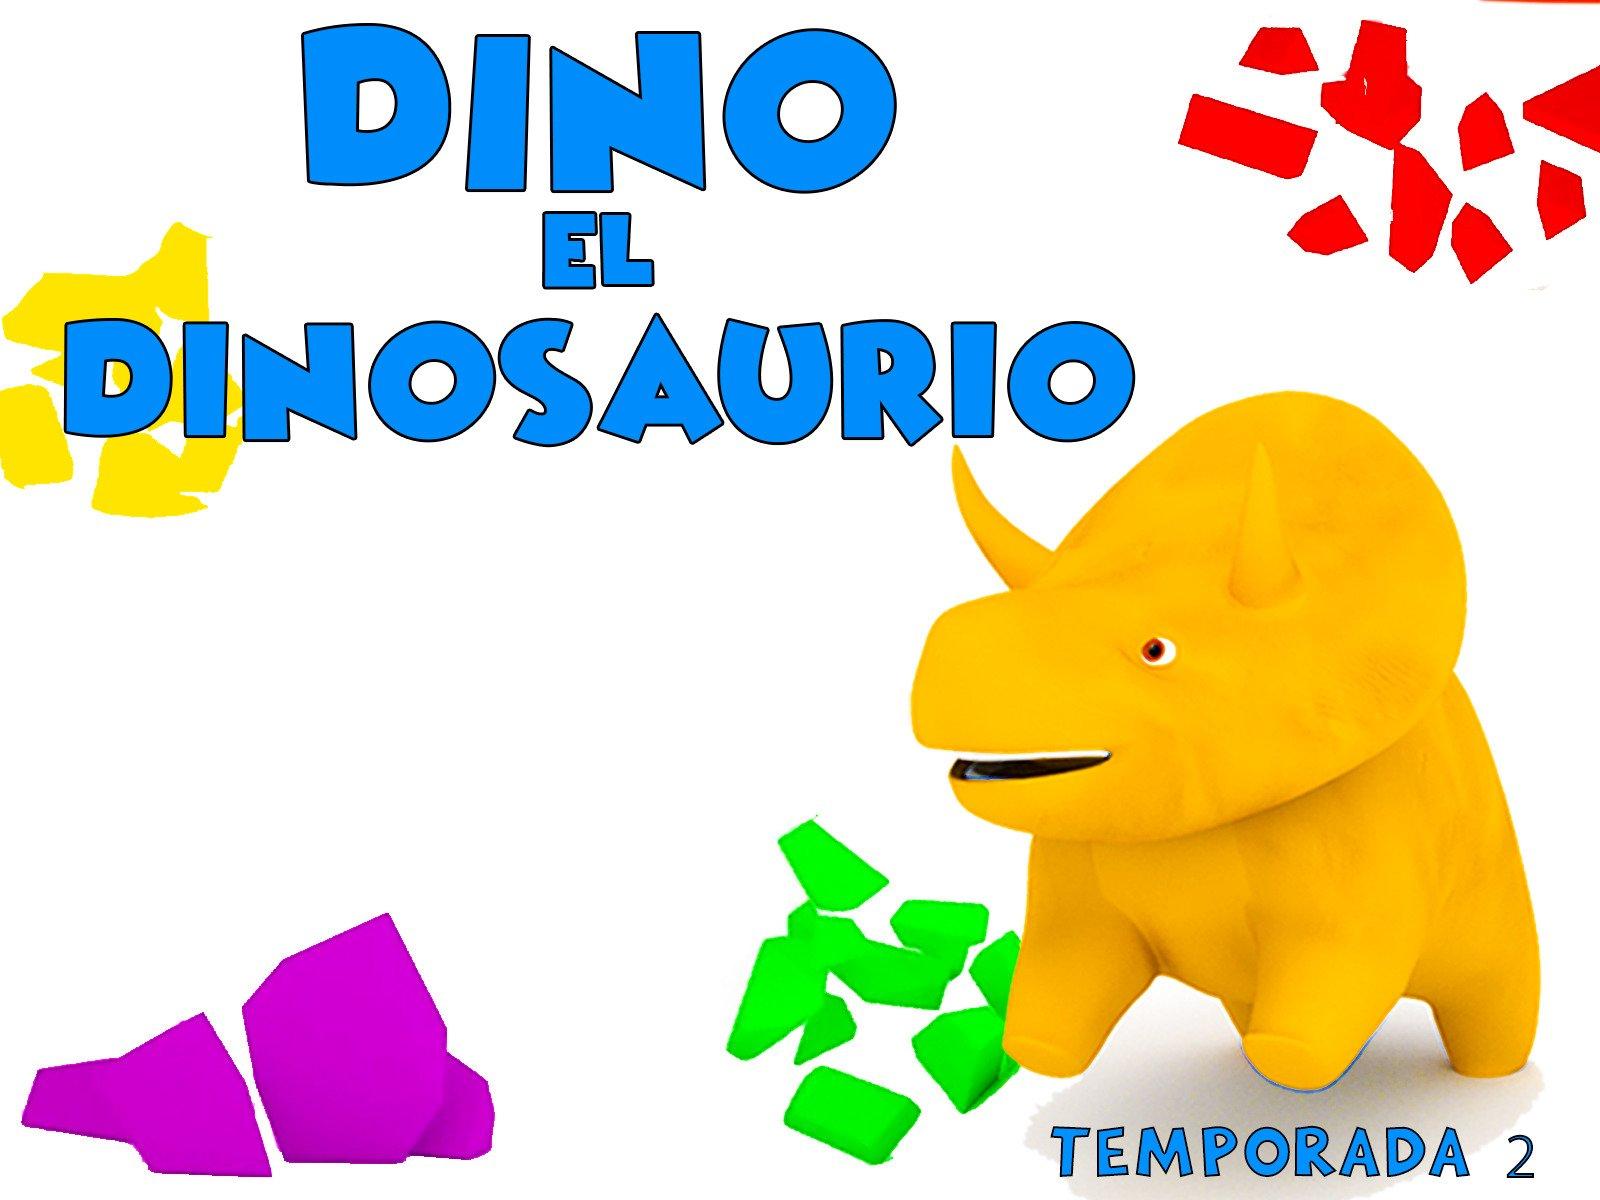 Amazon.com: Dino el Dinosaurio: Charles Courcier, Edouard Desmettre, Arthur Lener